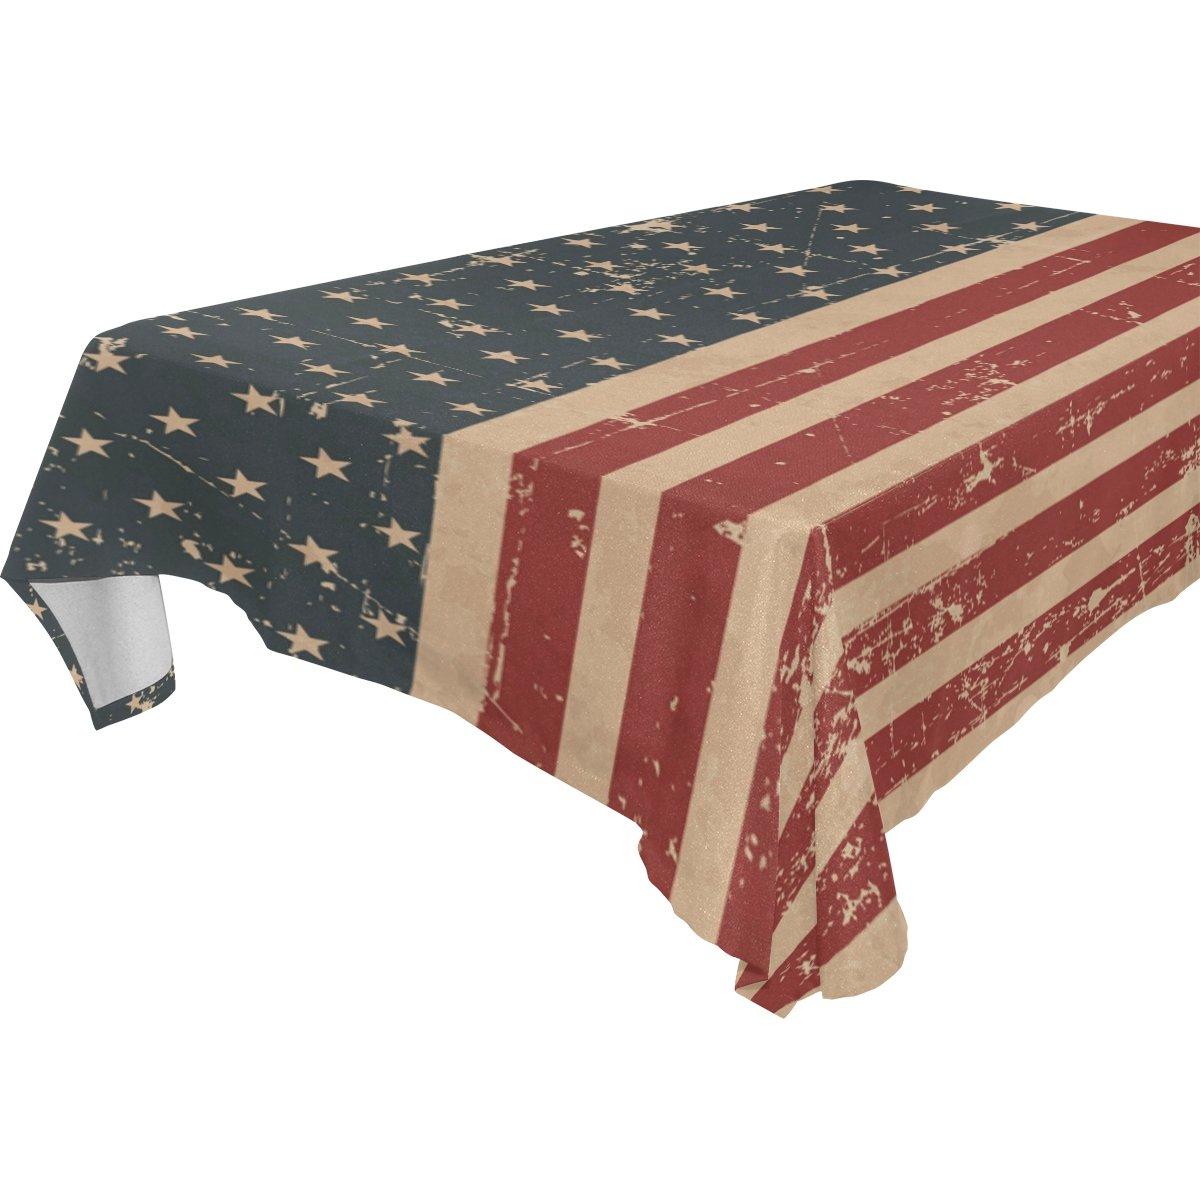 alirea長方形愛国アメリカ国旗テーブルクロス用ウェディングパーティー休日洗濯可能ポリエステルテーブル布カバー、54 x 54インチ 60x108(in) 60x108(in)  B07B94CBCF